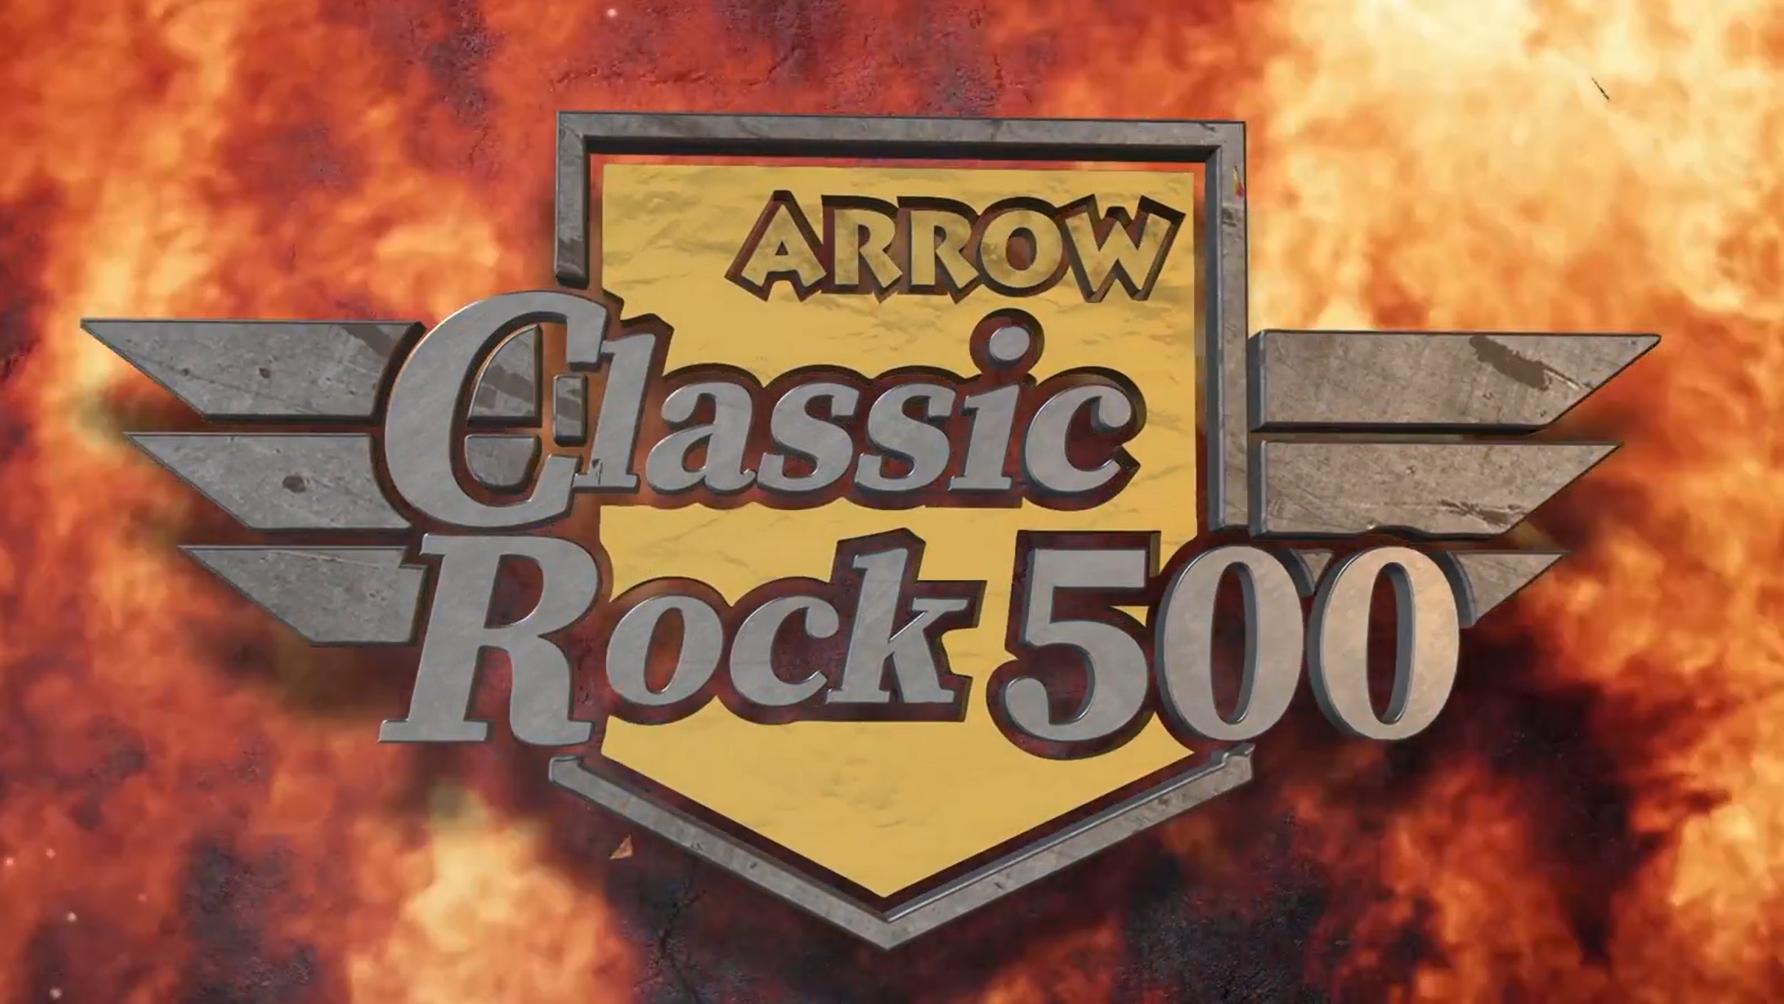 Classic Rock 500 op Arrow Classic Rock